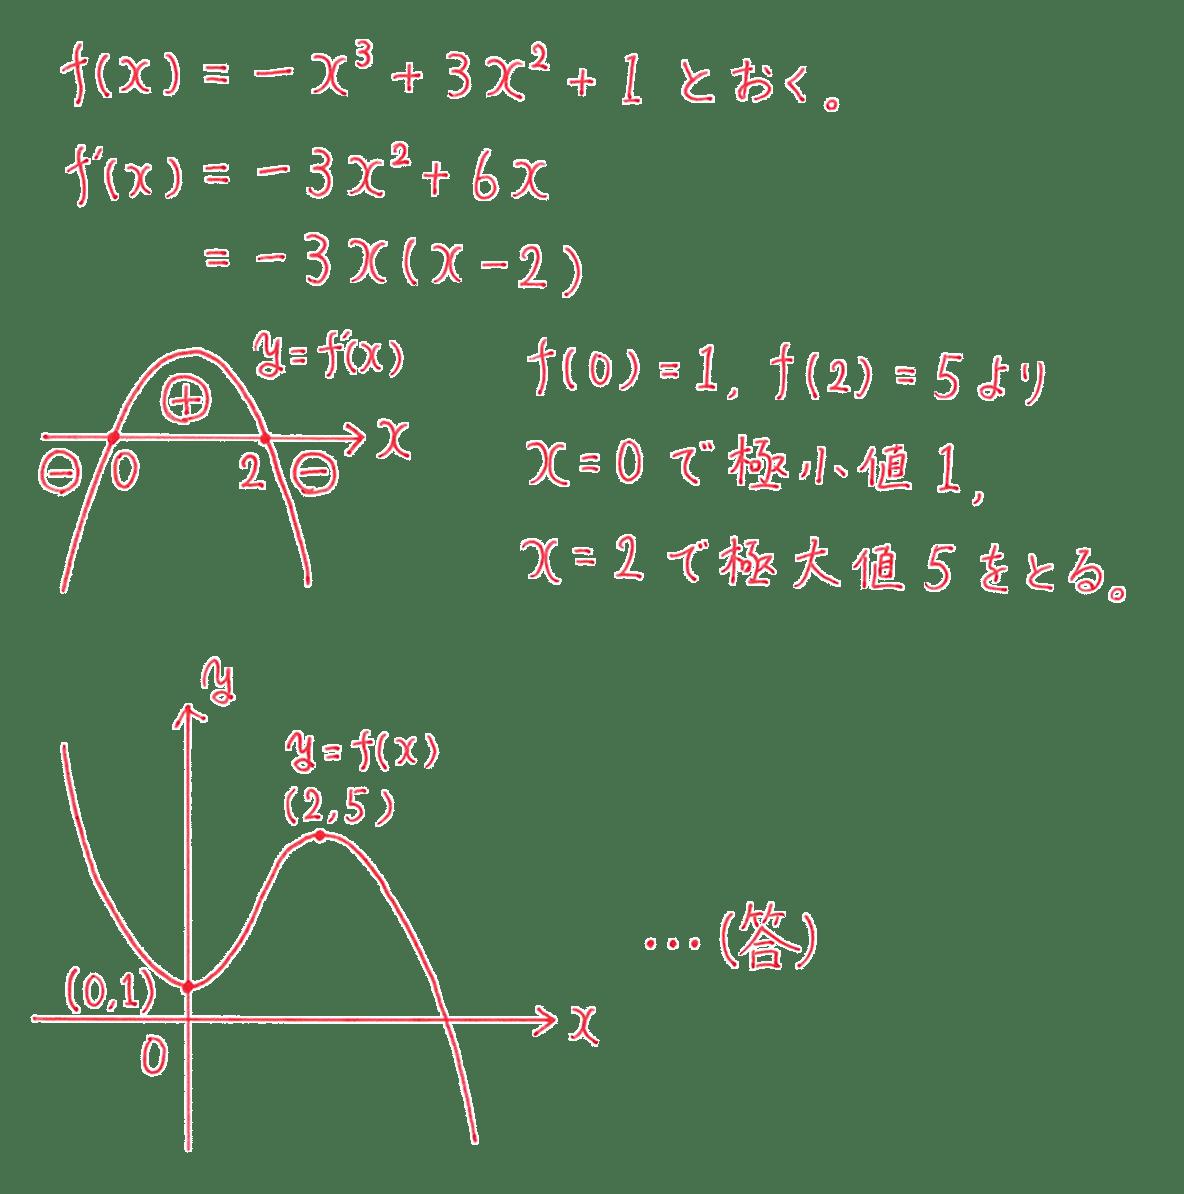 高校数学Ⅱ 微分法と積分法13 練習 答え